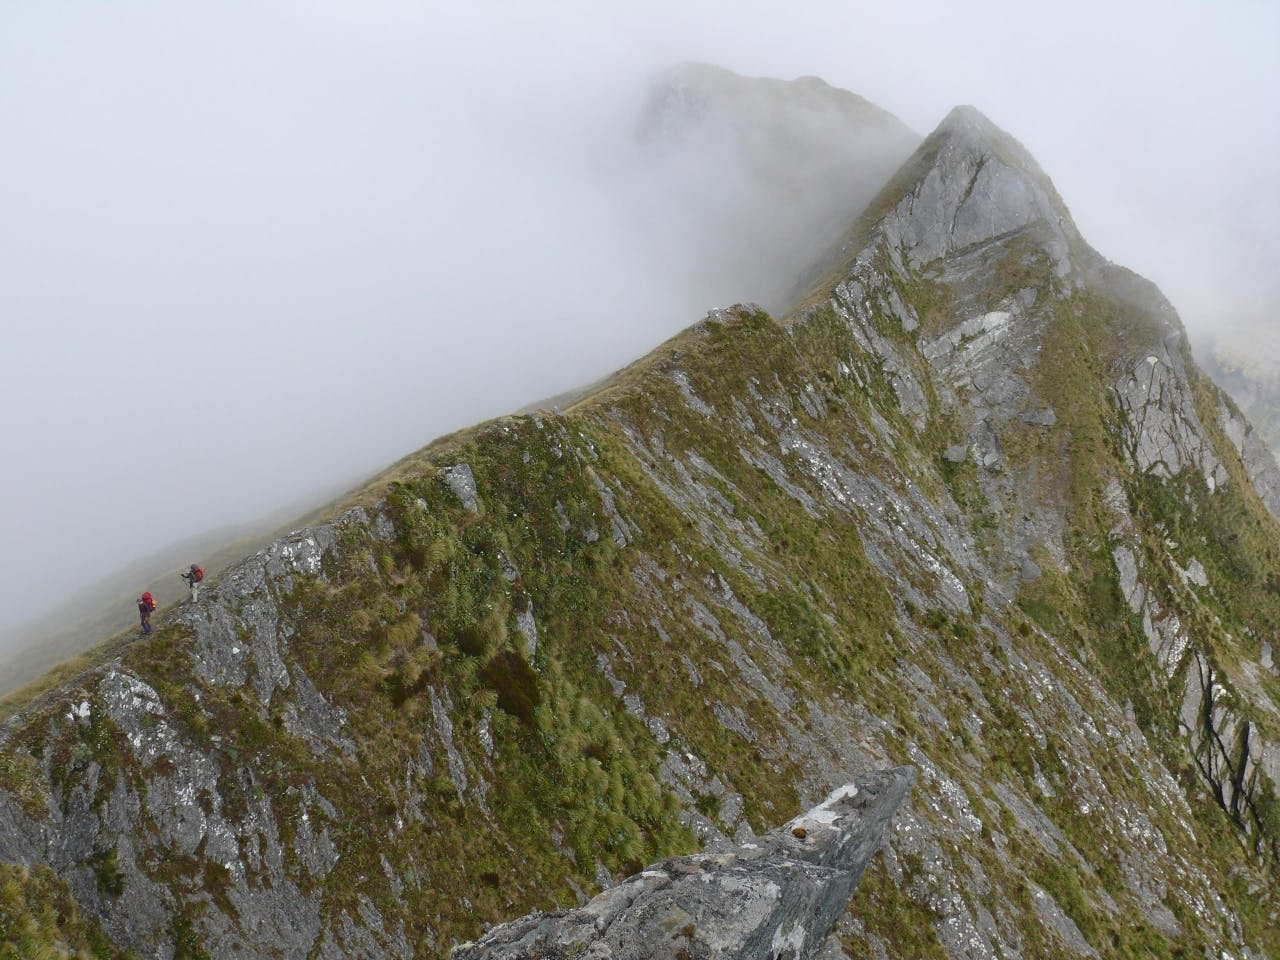 Trampers traverse the scary Selborne Range. Photo: Geoff Spearpoint